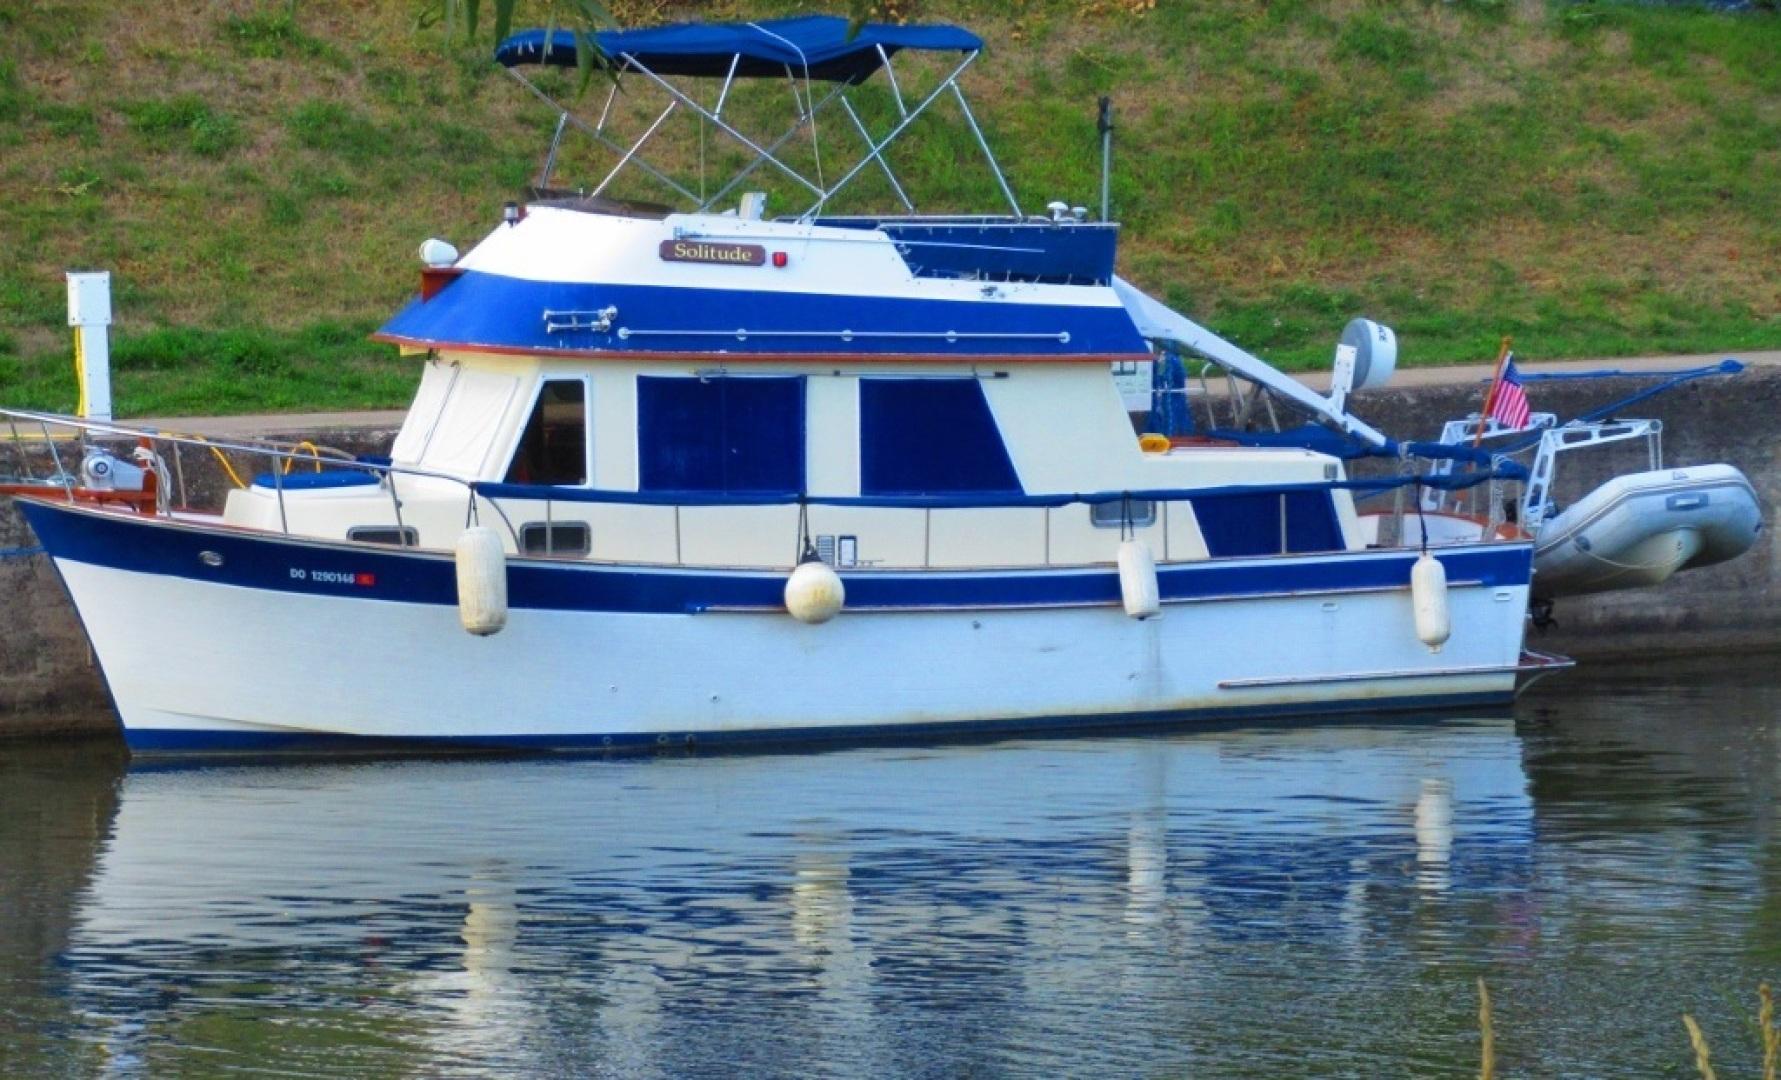 CHB-34 Trawler 1985-Solitude North Tonawanda-New York-United States-1475265 | Thumbnail